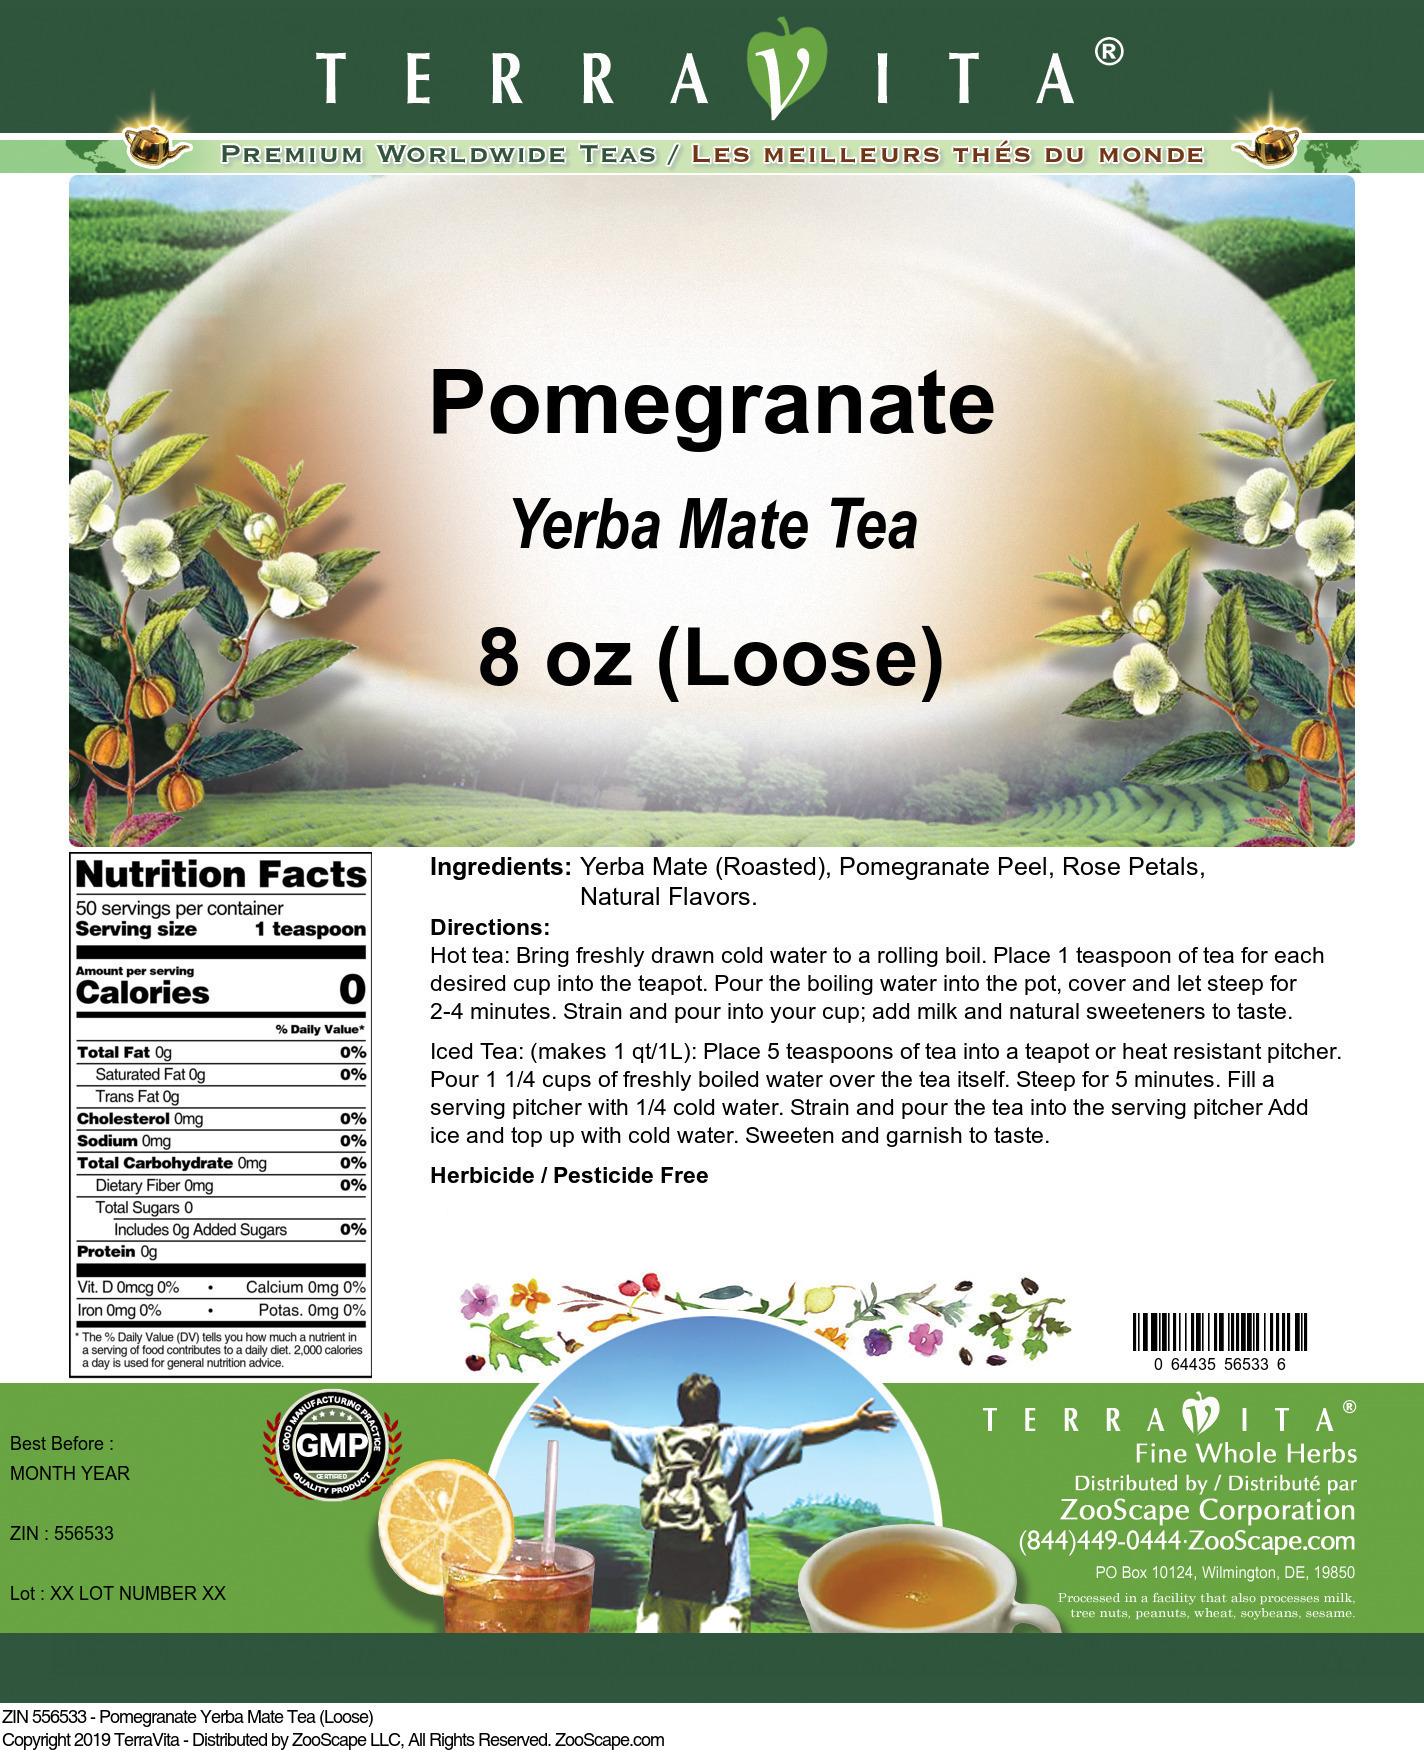 Pomegranate Yerba Mate Tea (Loose)